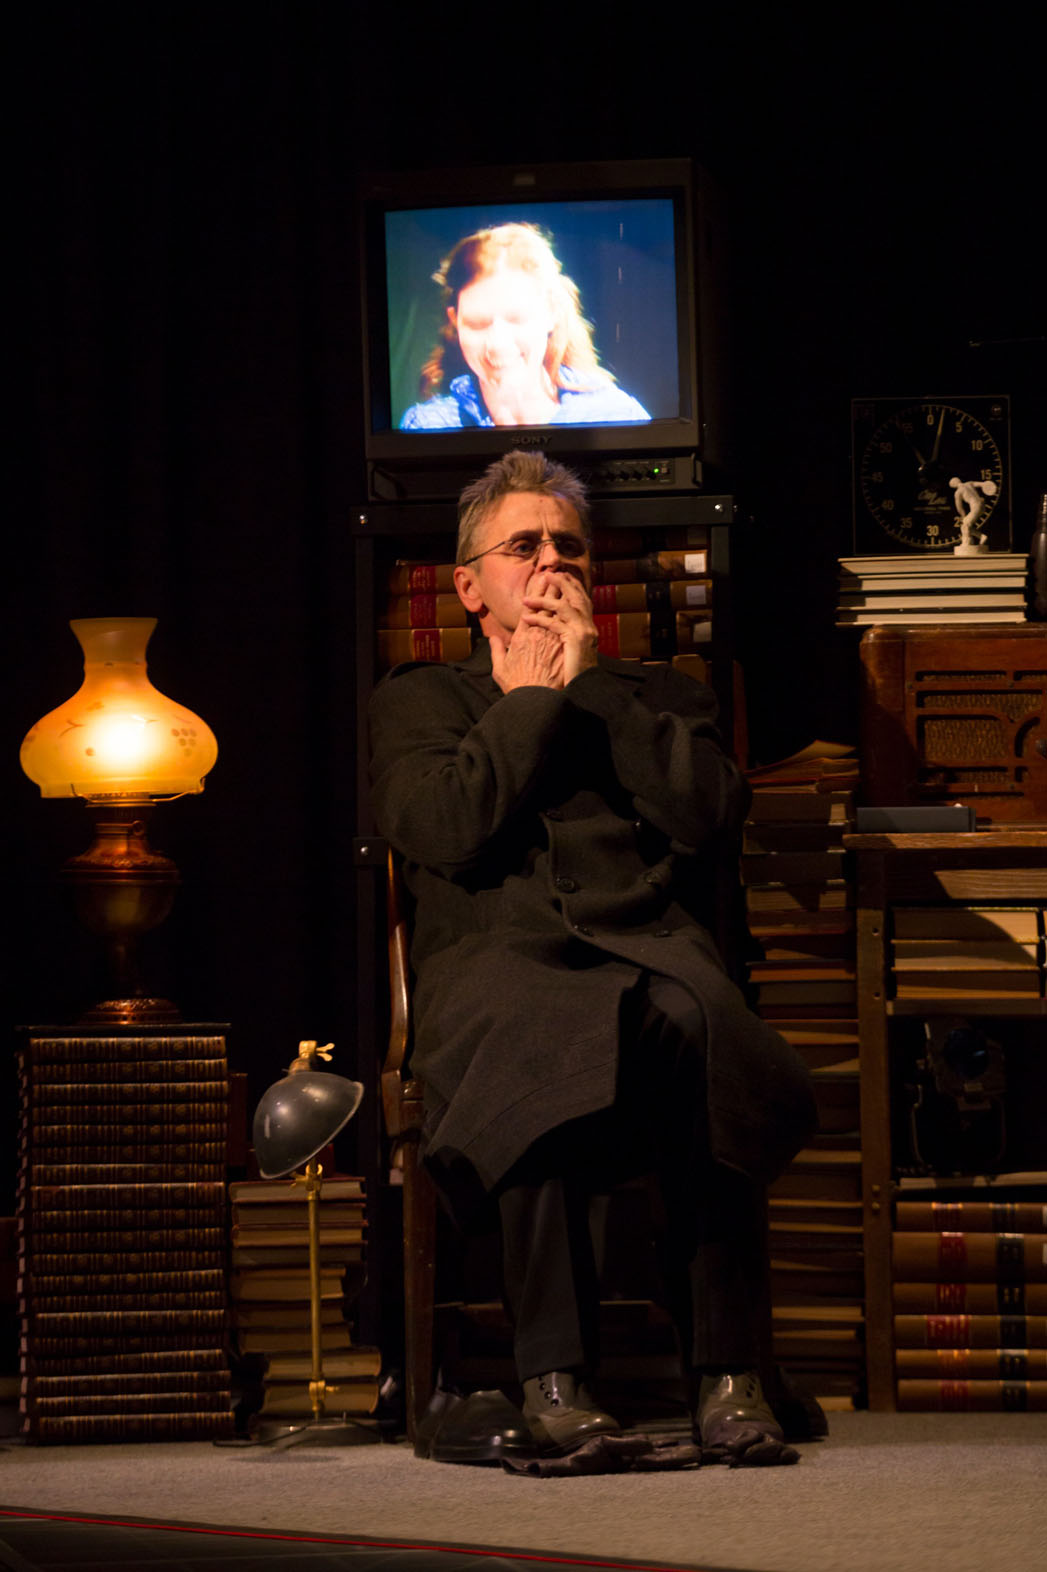 Man in a Case Theater Still - P 2014